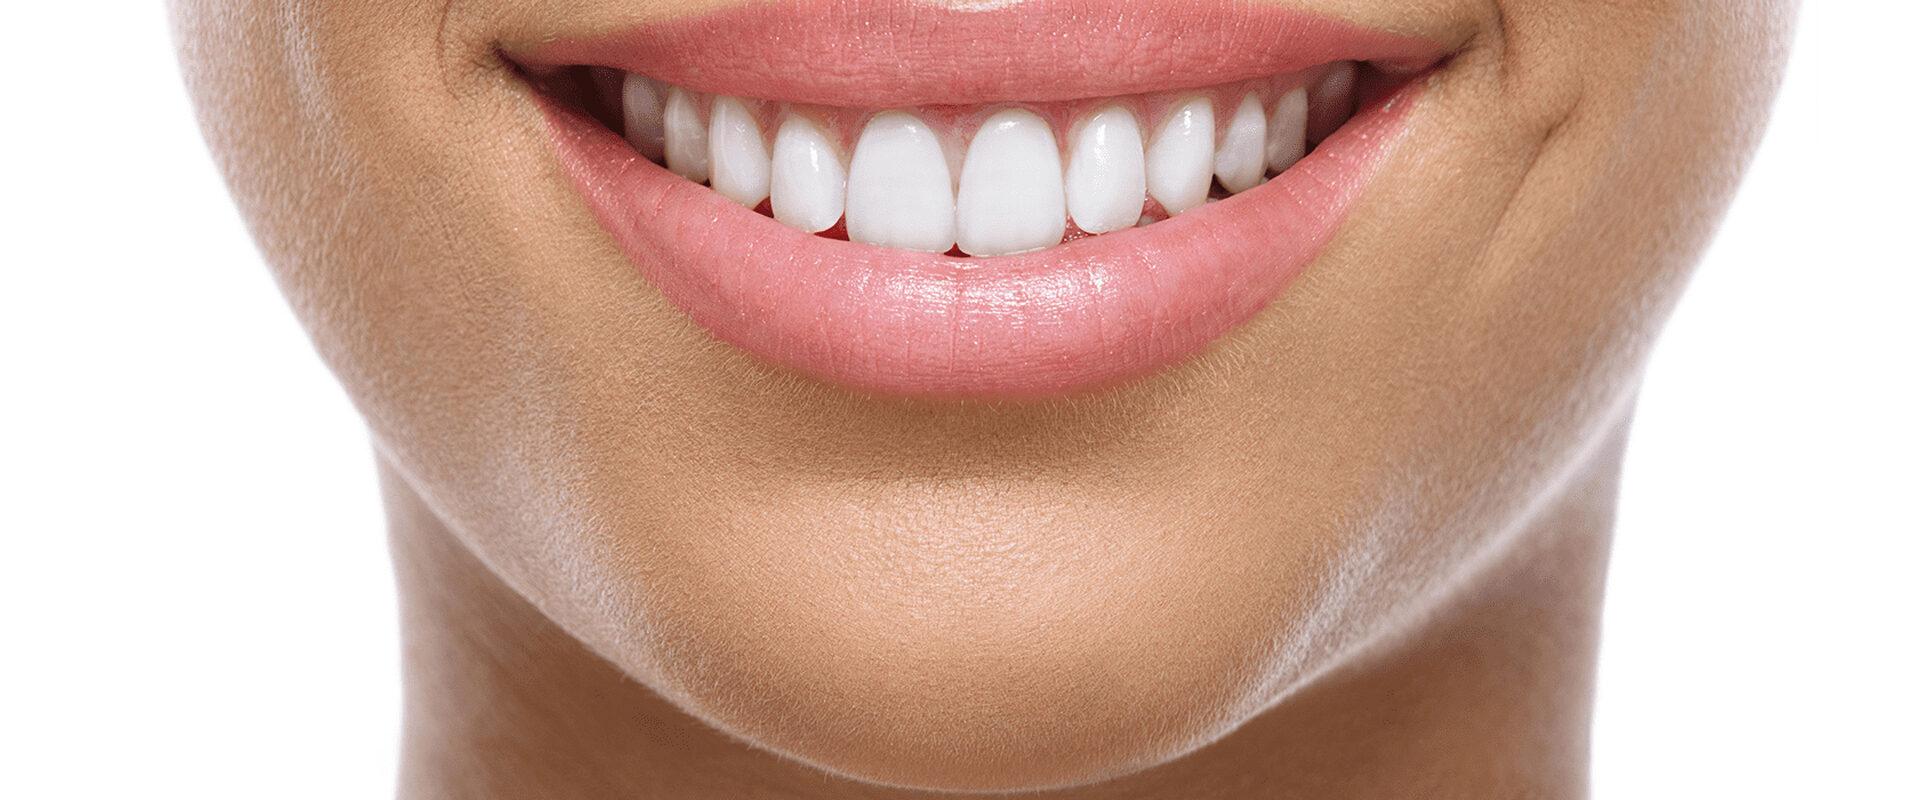 Houston Oral Healthcare Specialists